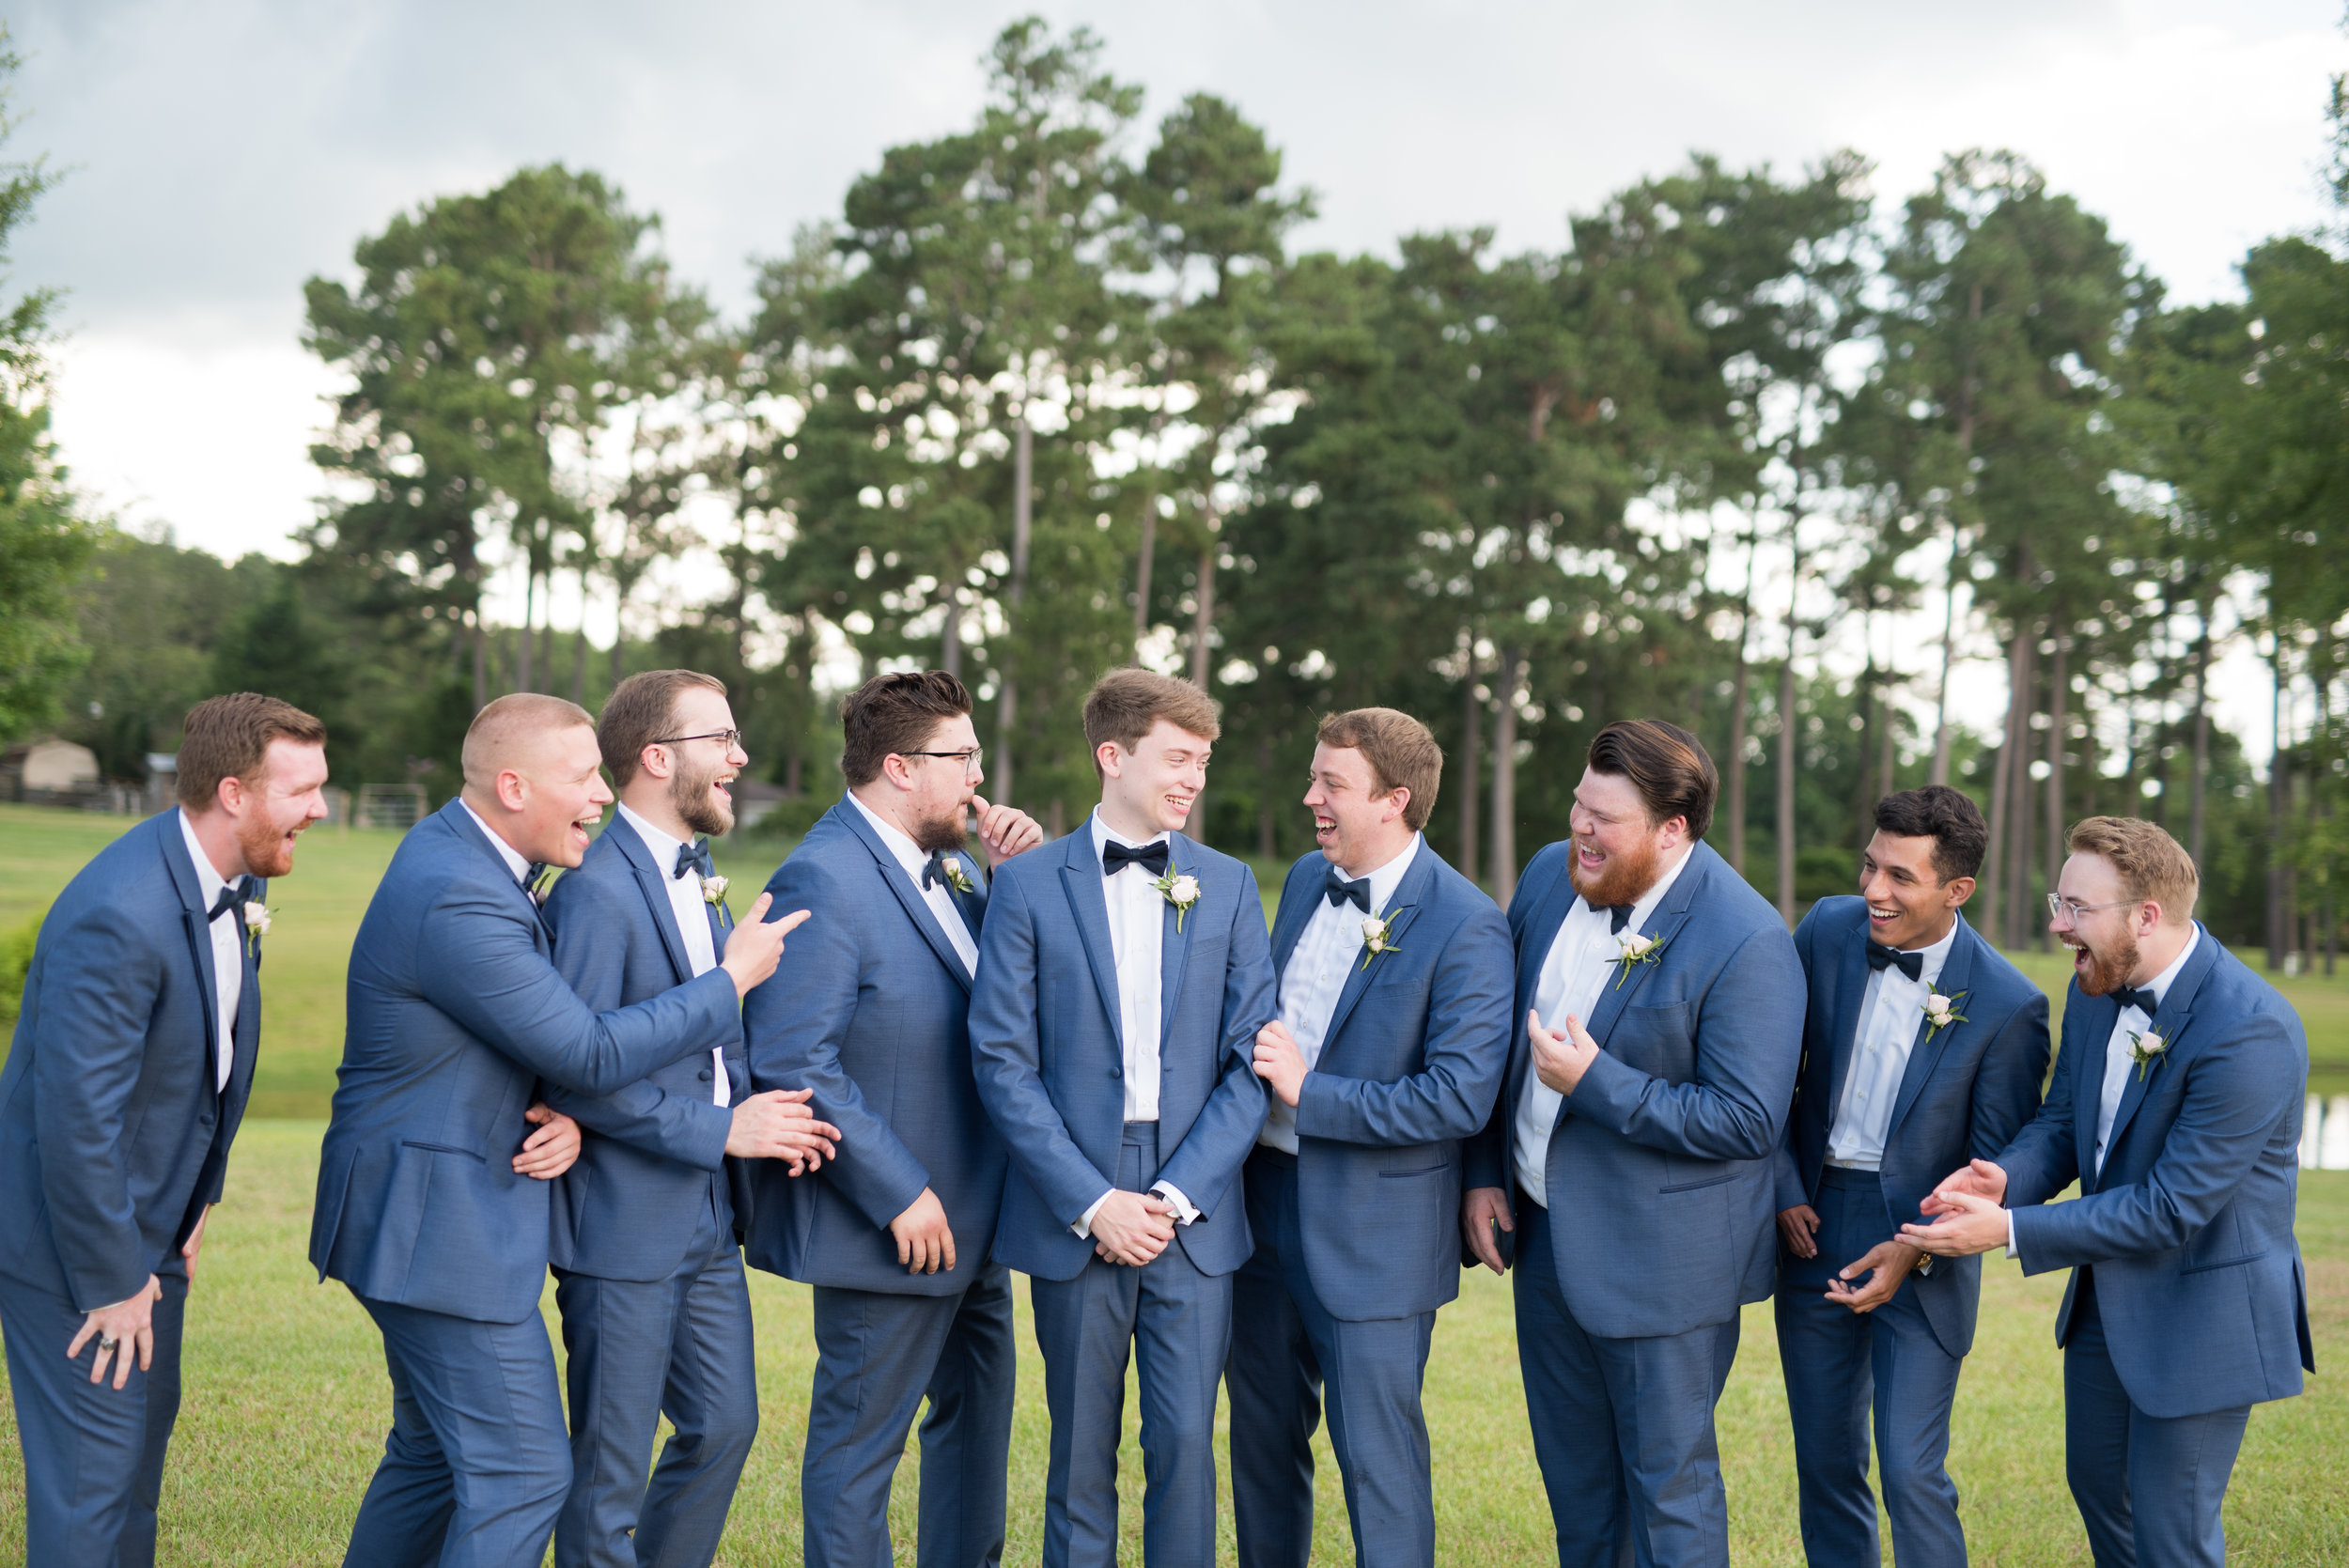 The Barn at Bridlewood wedding in Hattiesburg, Mississippi (MS) in June | the groomsmen